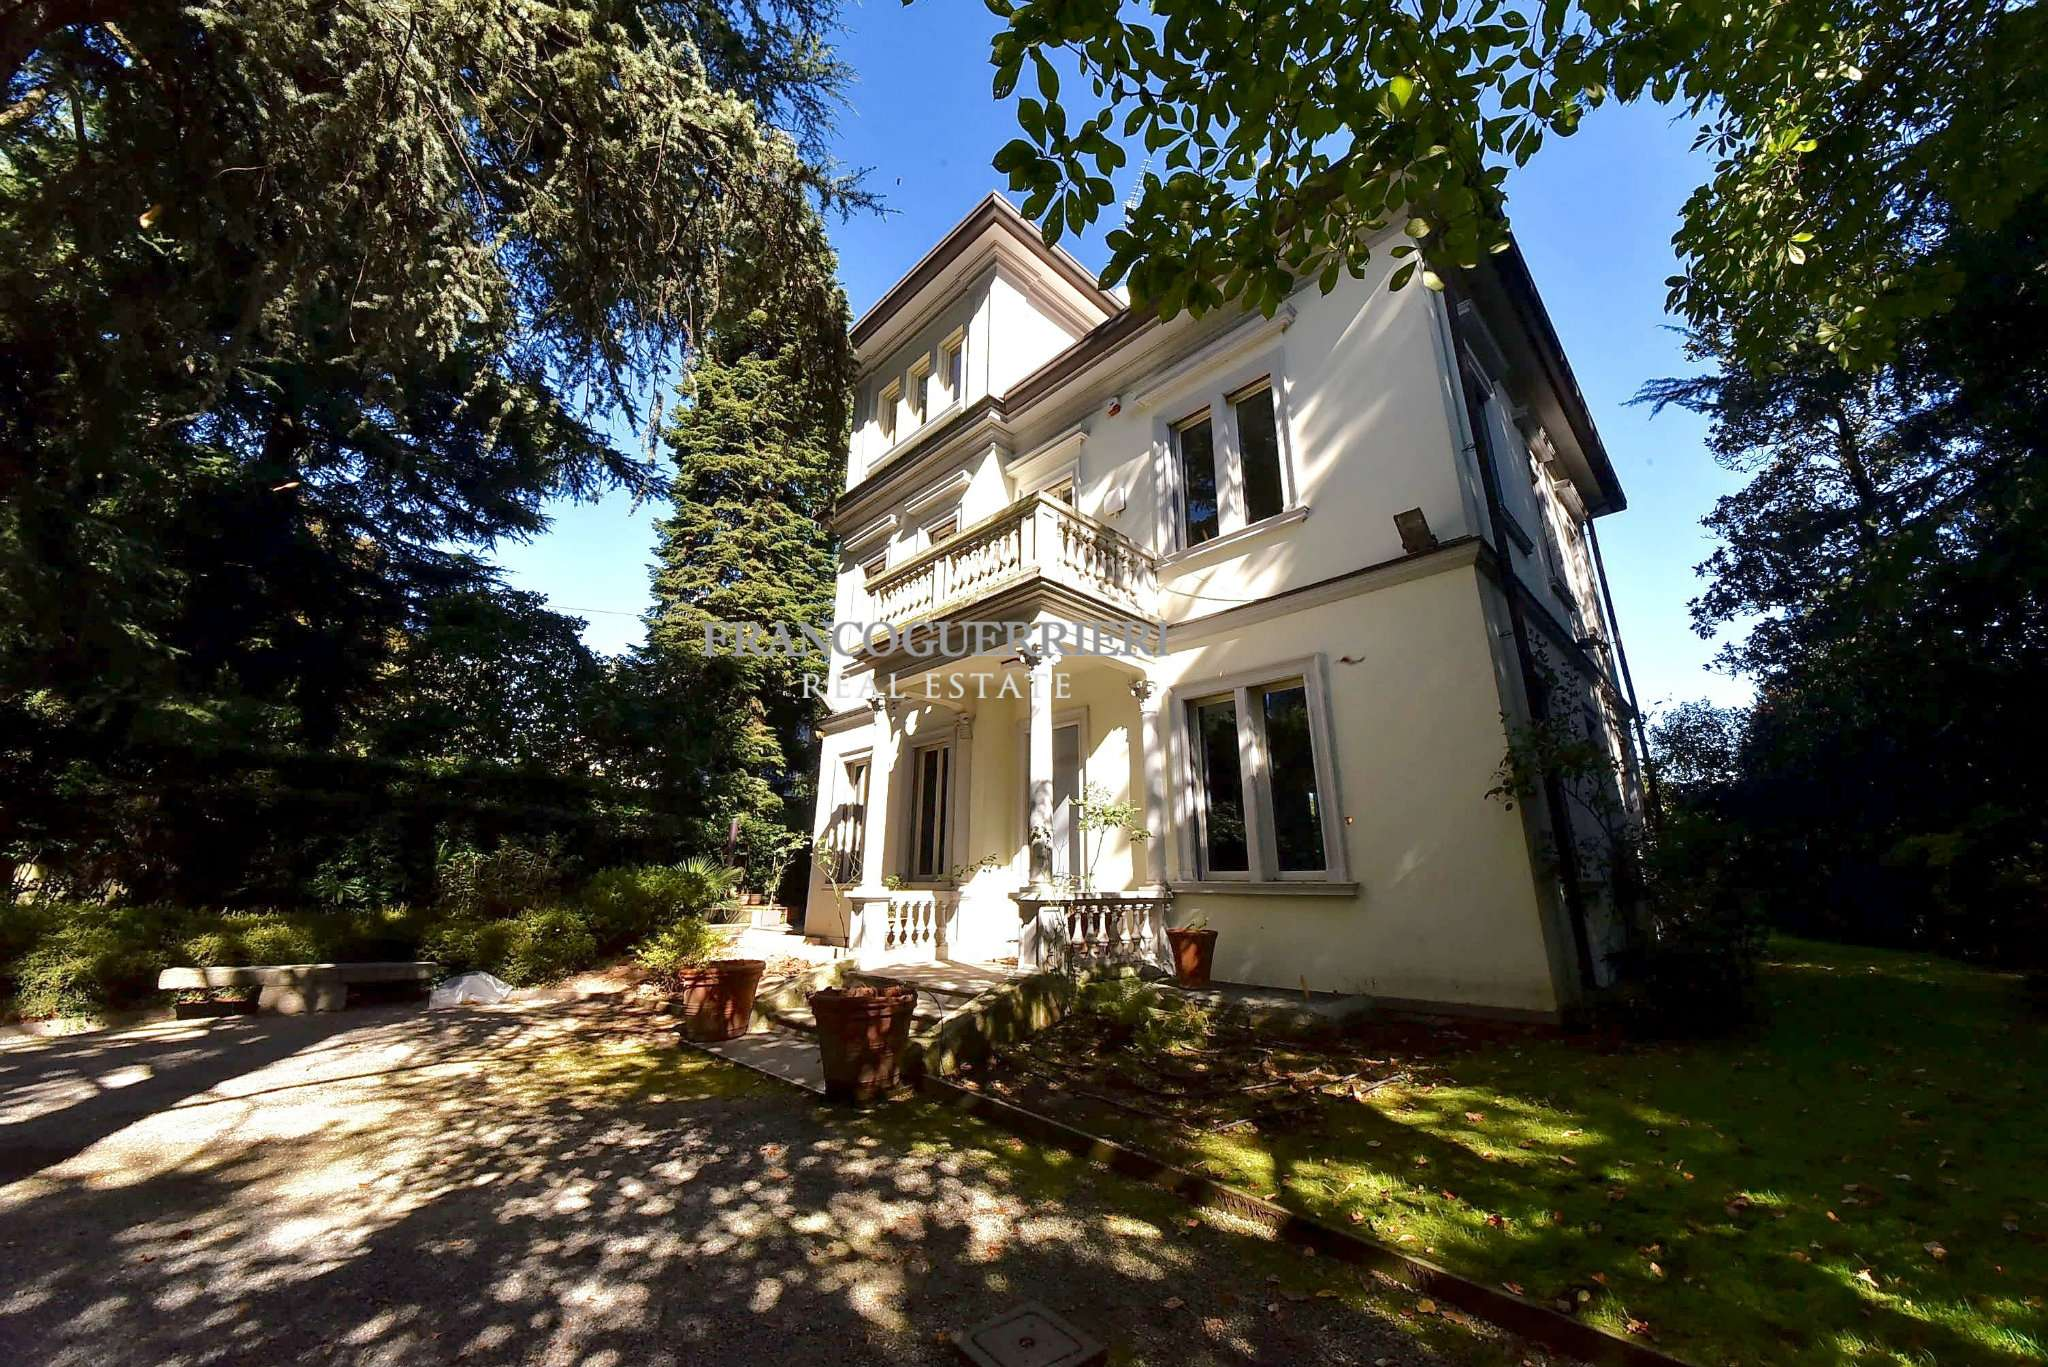 Villa in Vendita a Carate Brianza: 5 locali, 730 mq